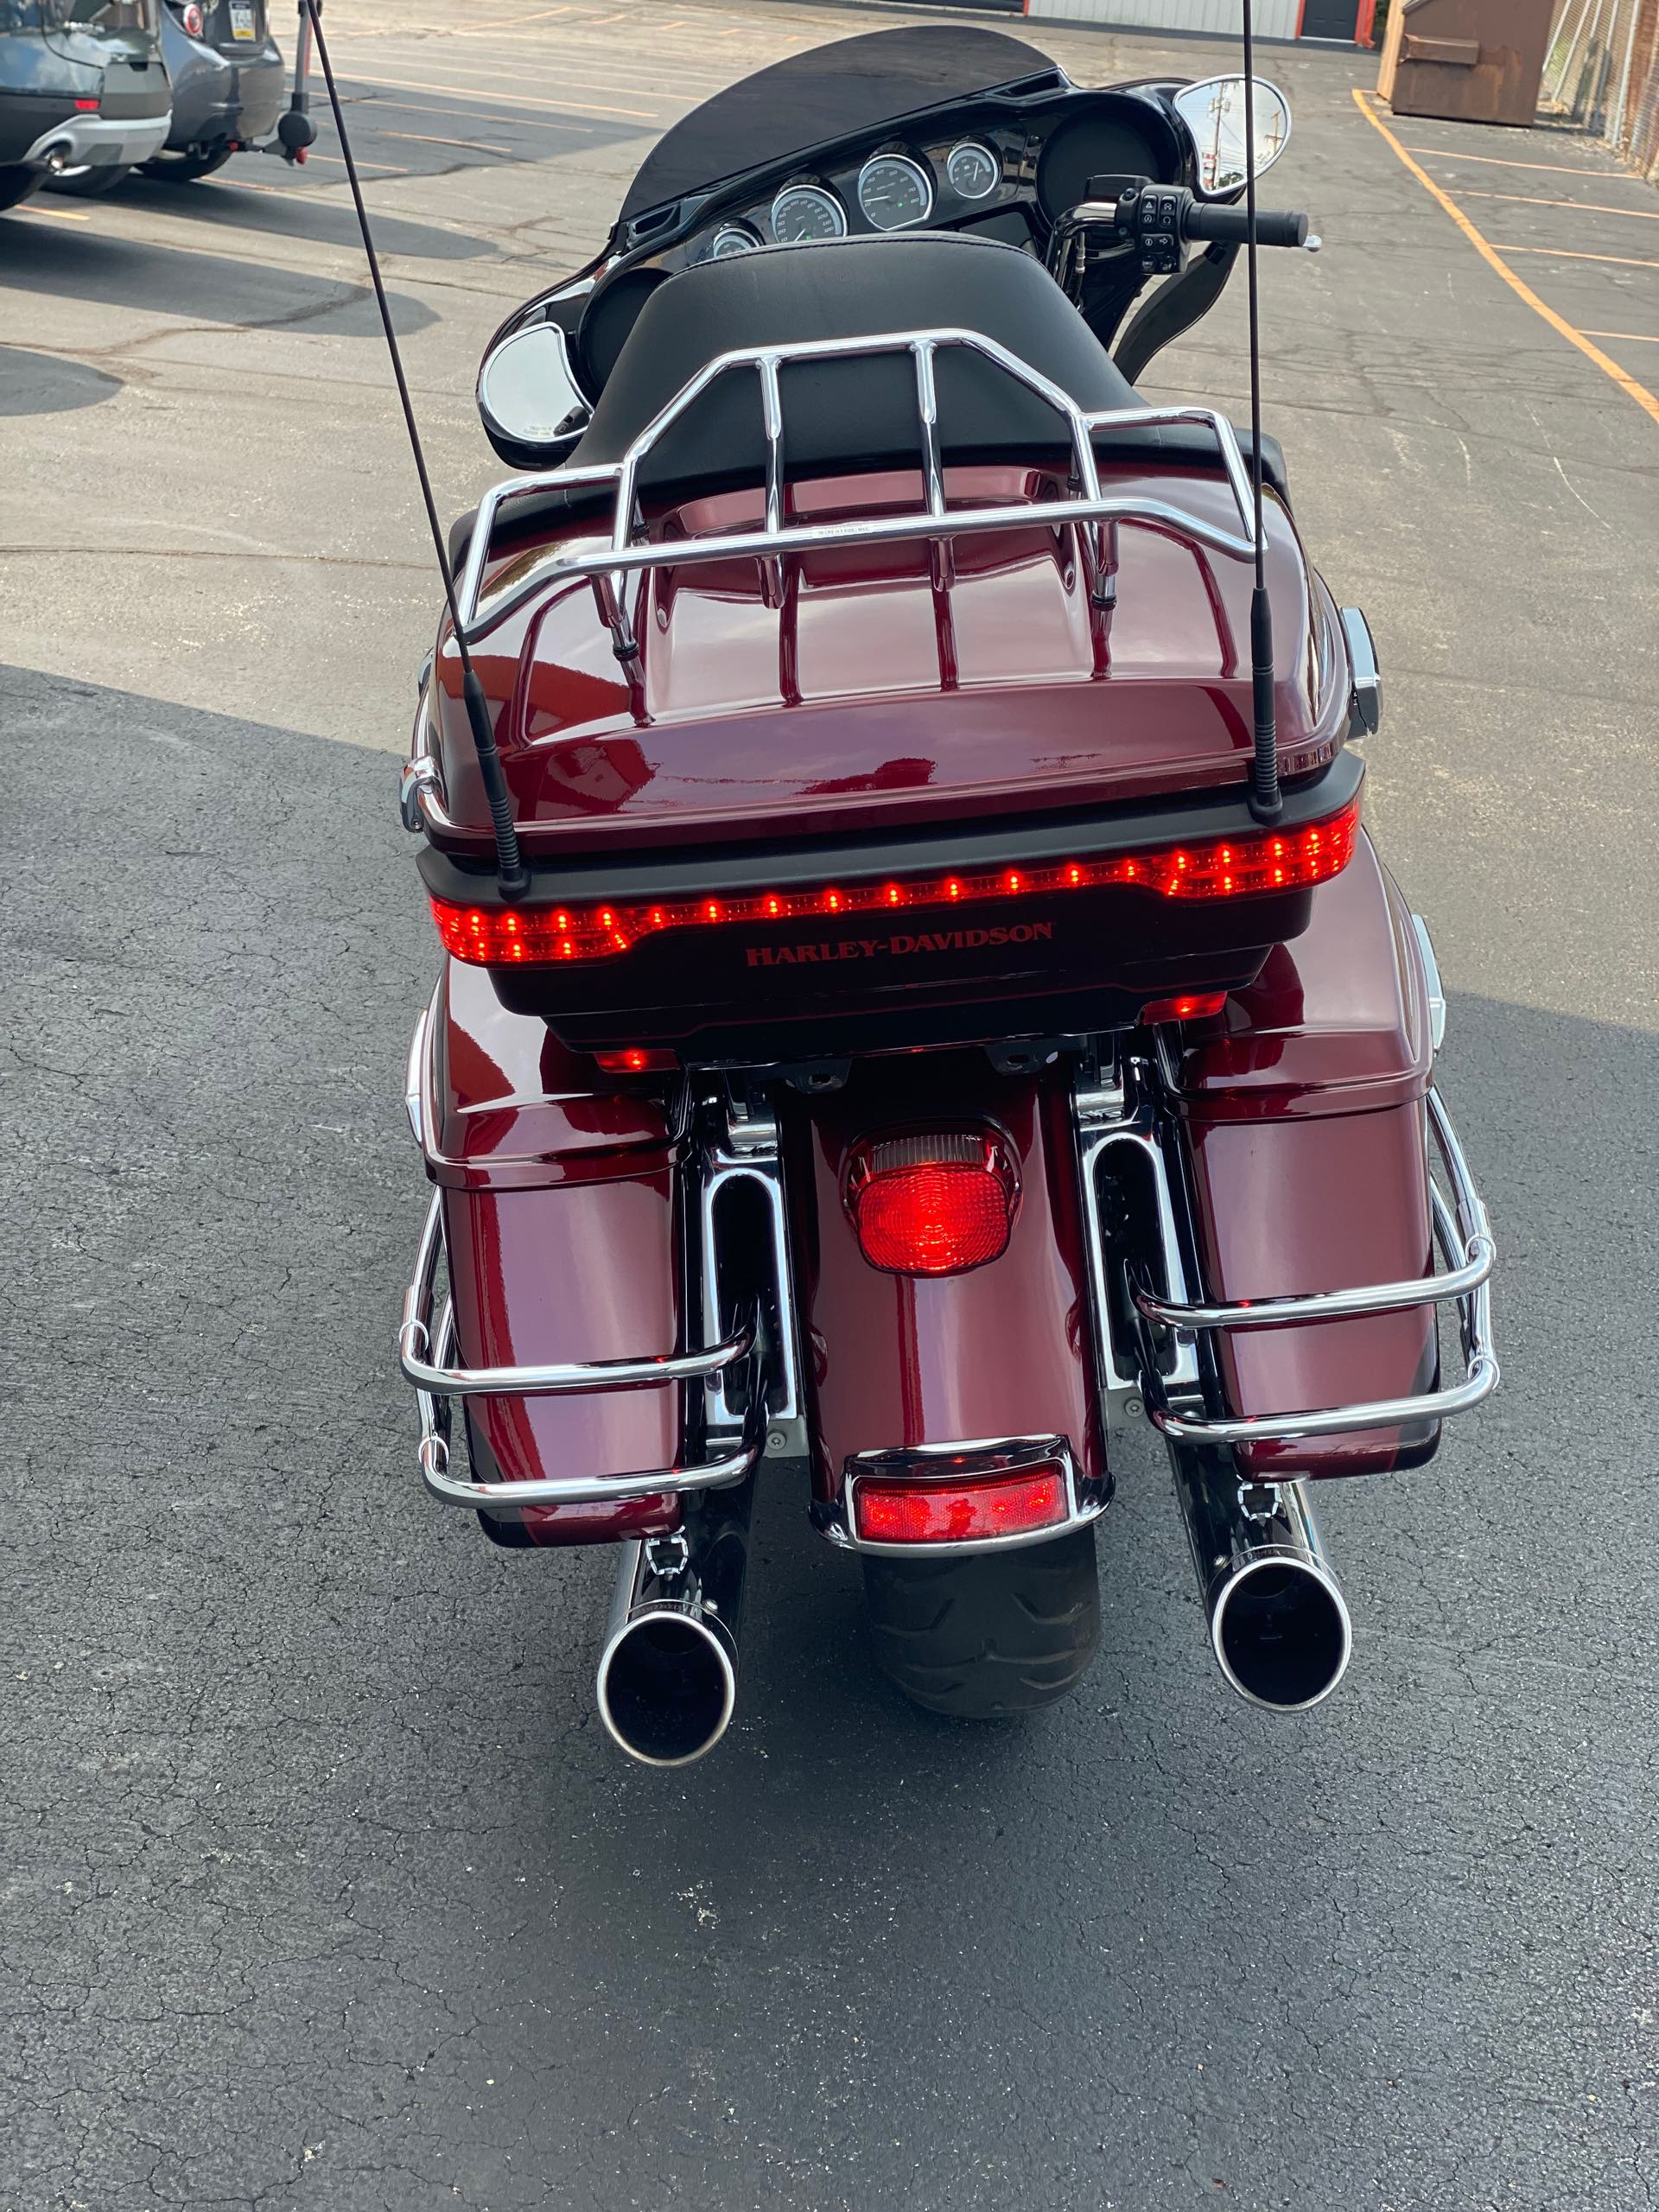 2014 Harley-Davidson Electra Glide Ultra Limited at Thunder Harley-Davidson